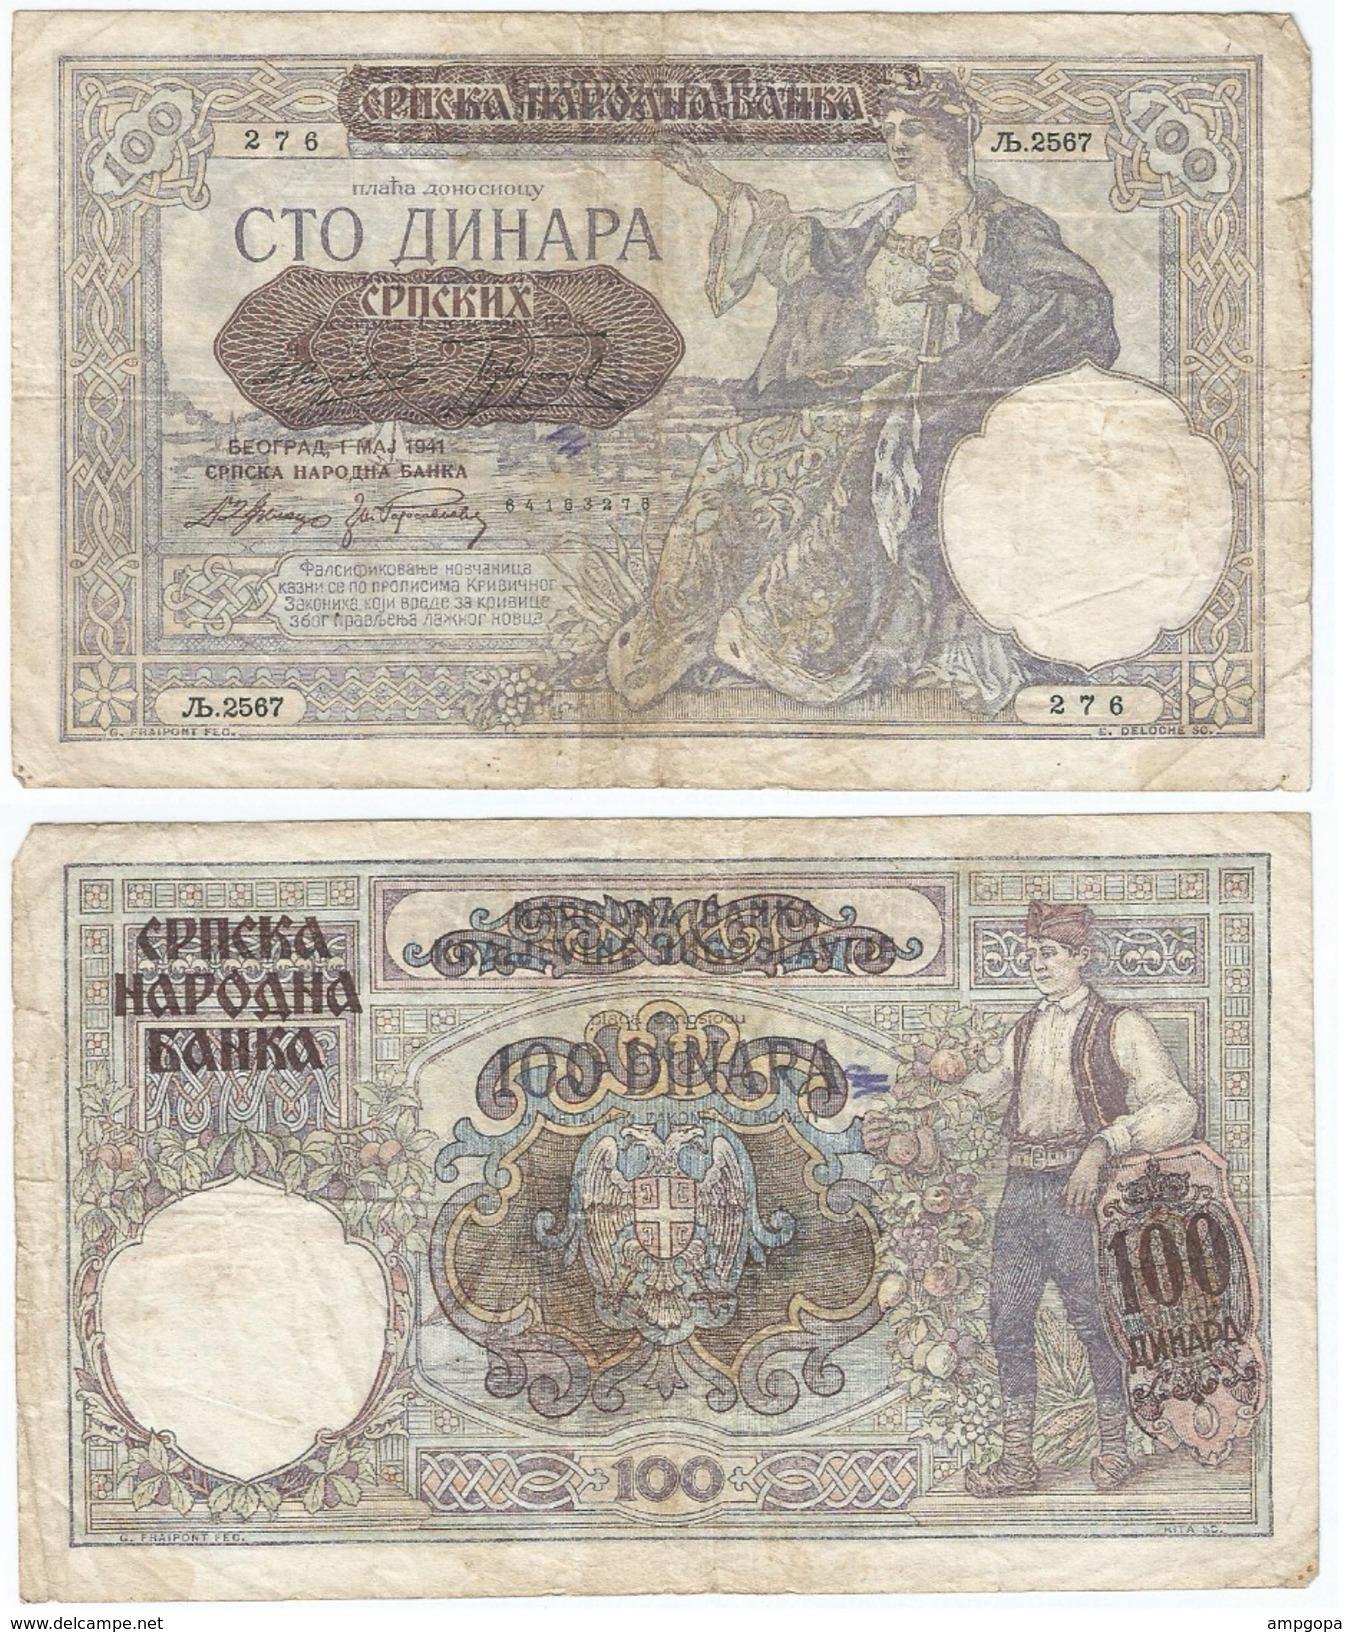 Serbia 100 Dinara 1941 Pick 23 Ref 588 - Serbia